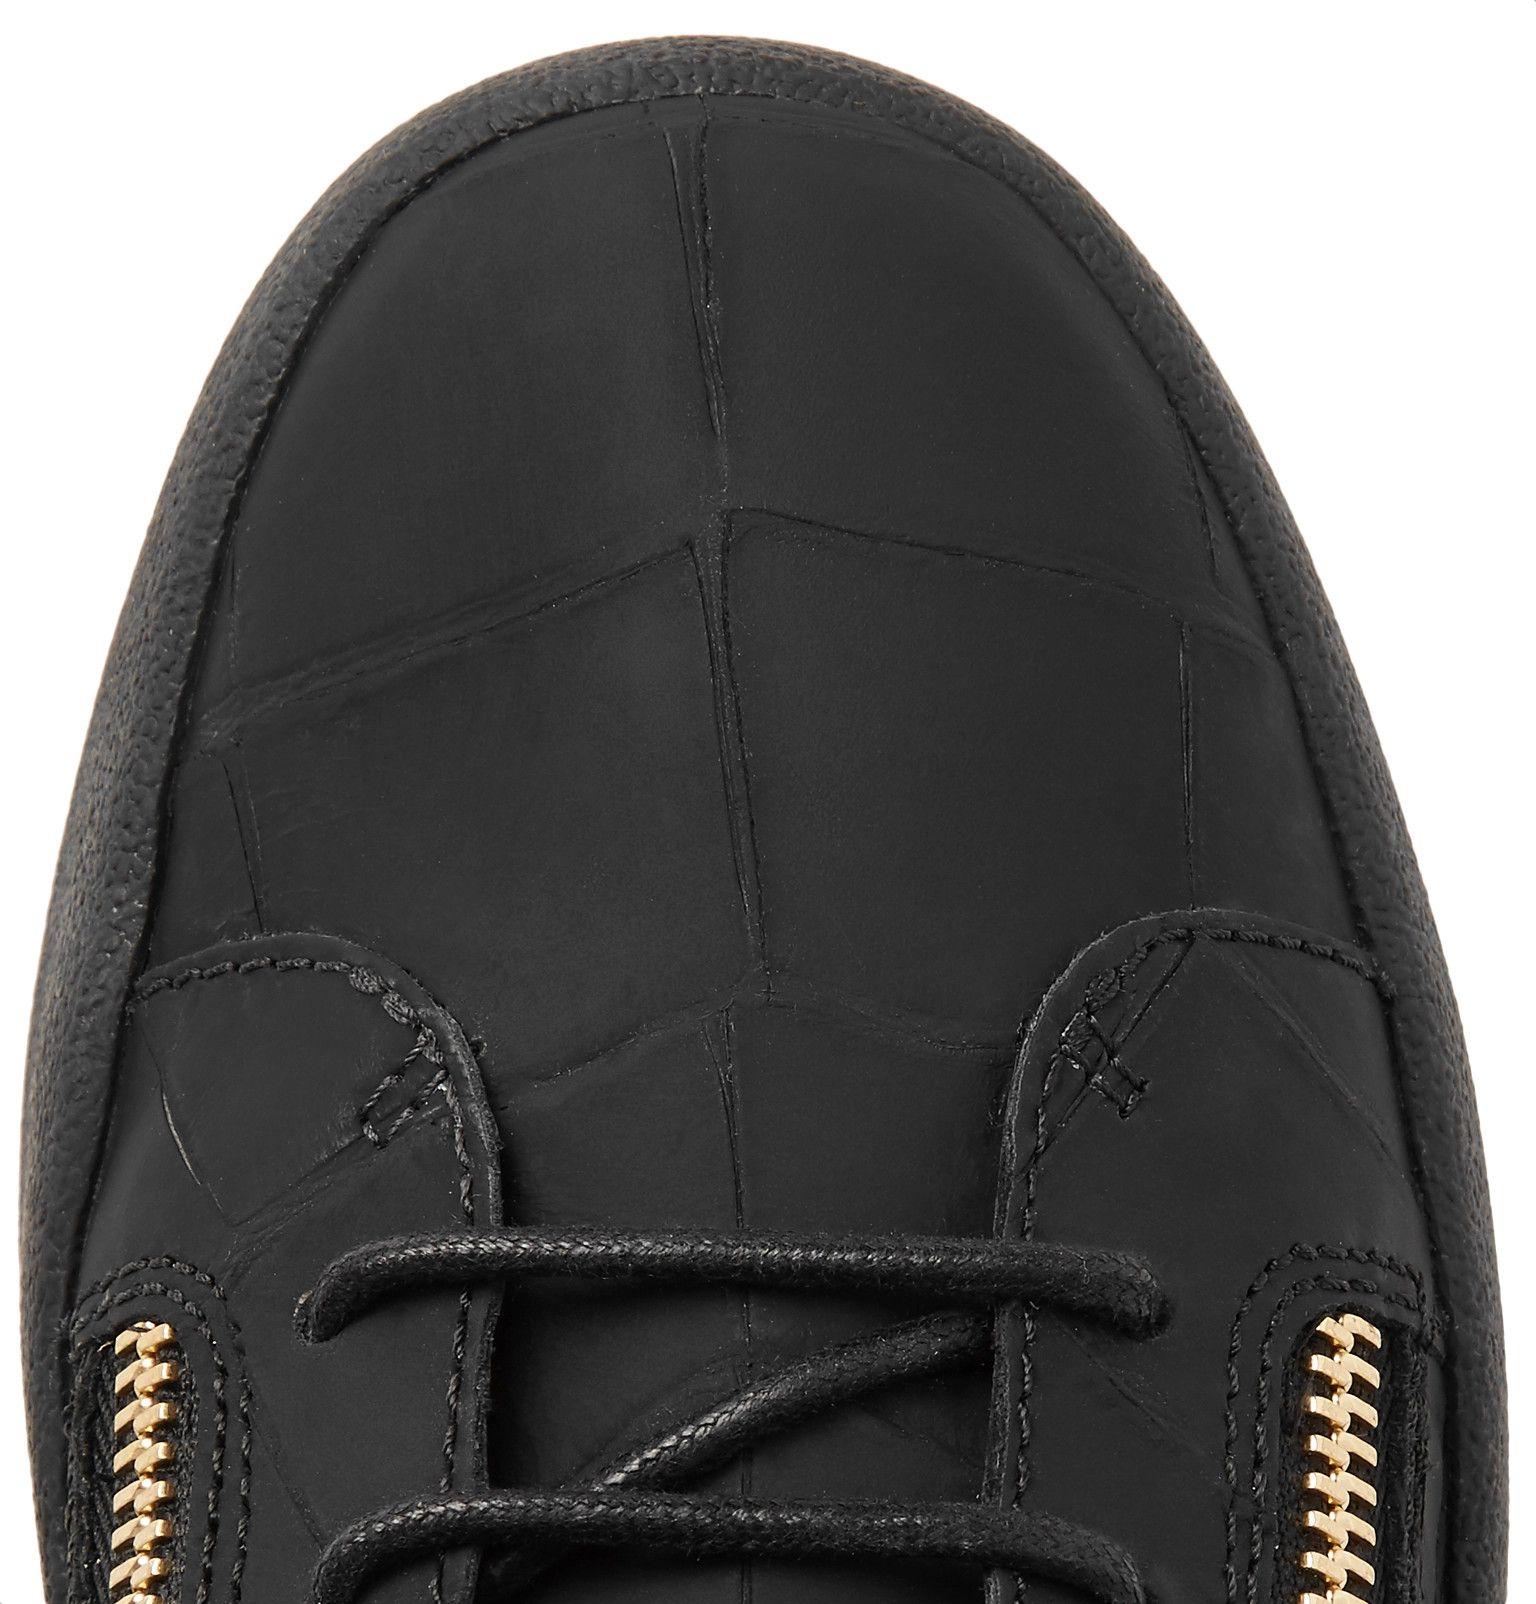 b1726c975facb Giuseppe Zanotti - Logoball Croc-Effect Leather High-Top Sneakers